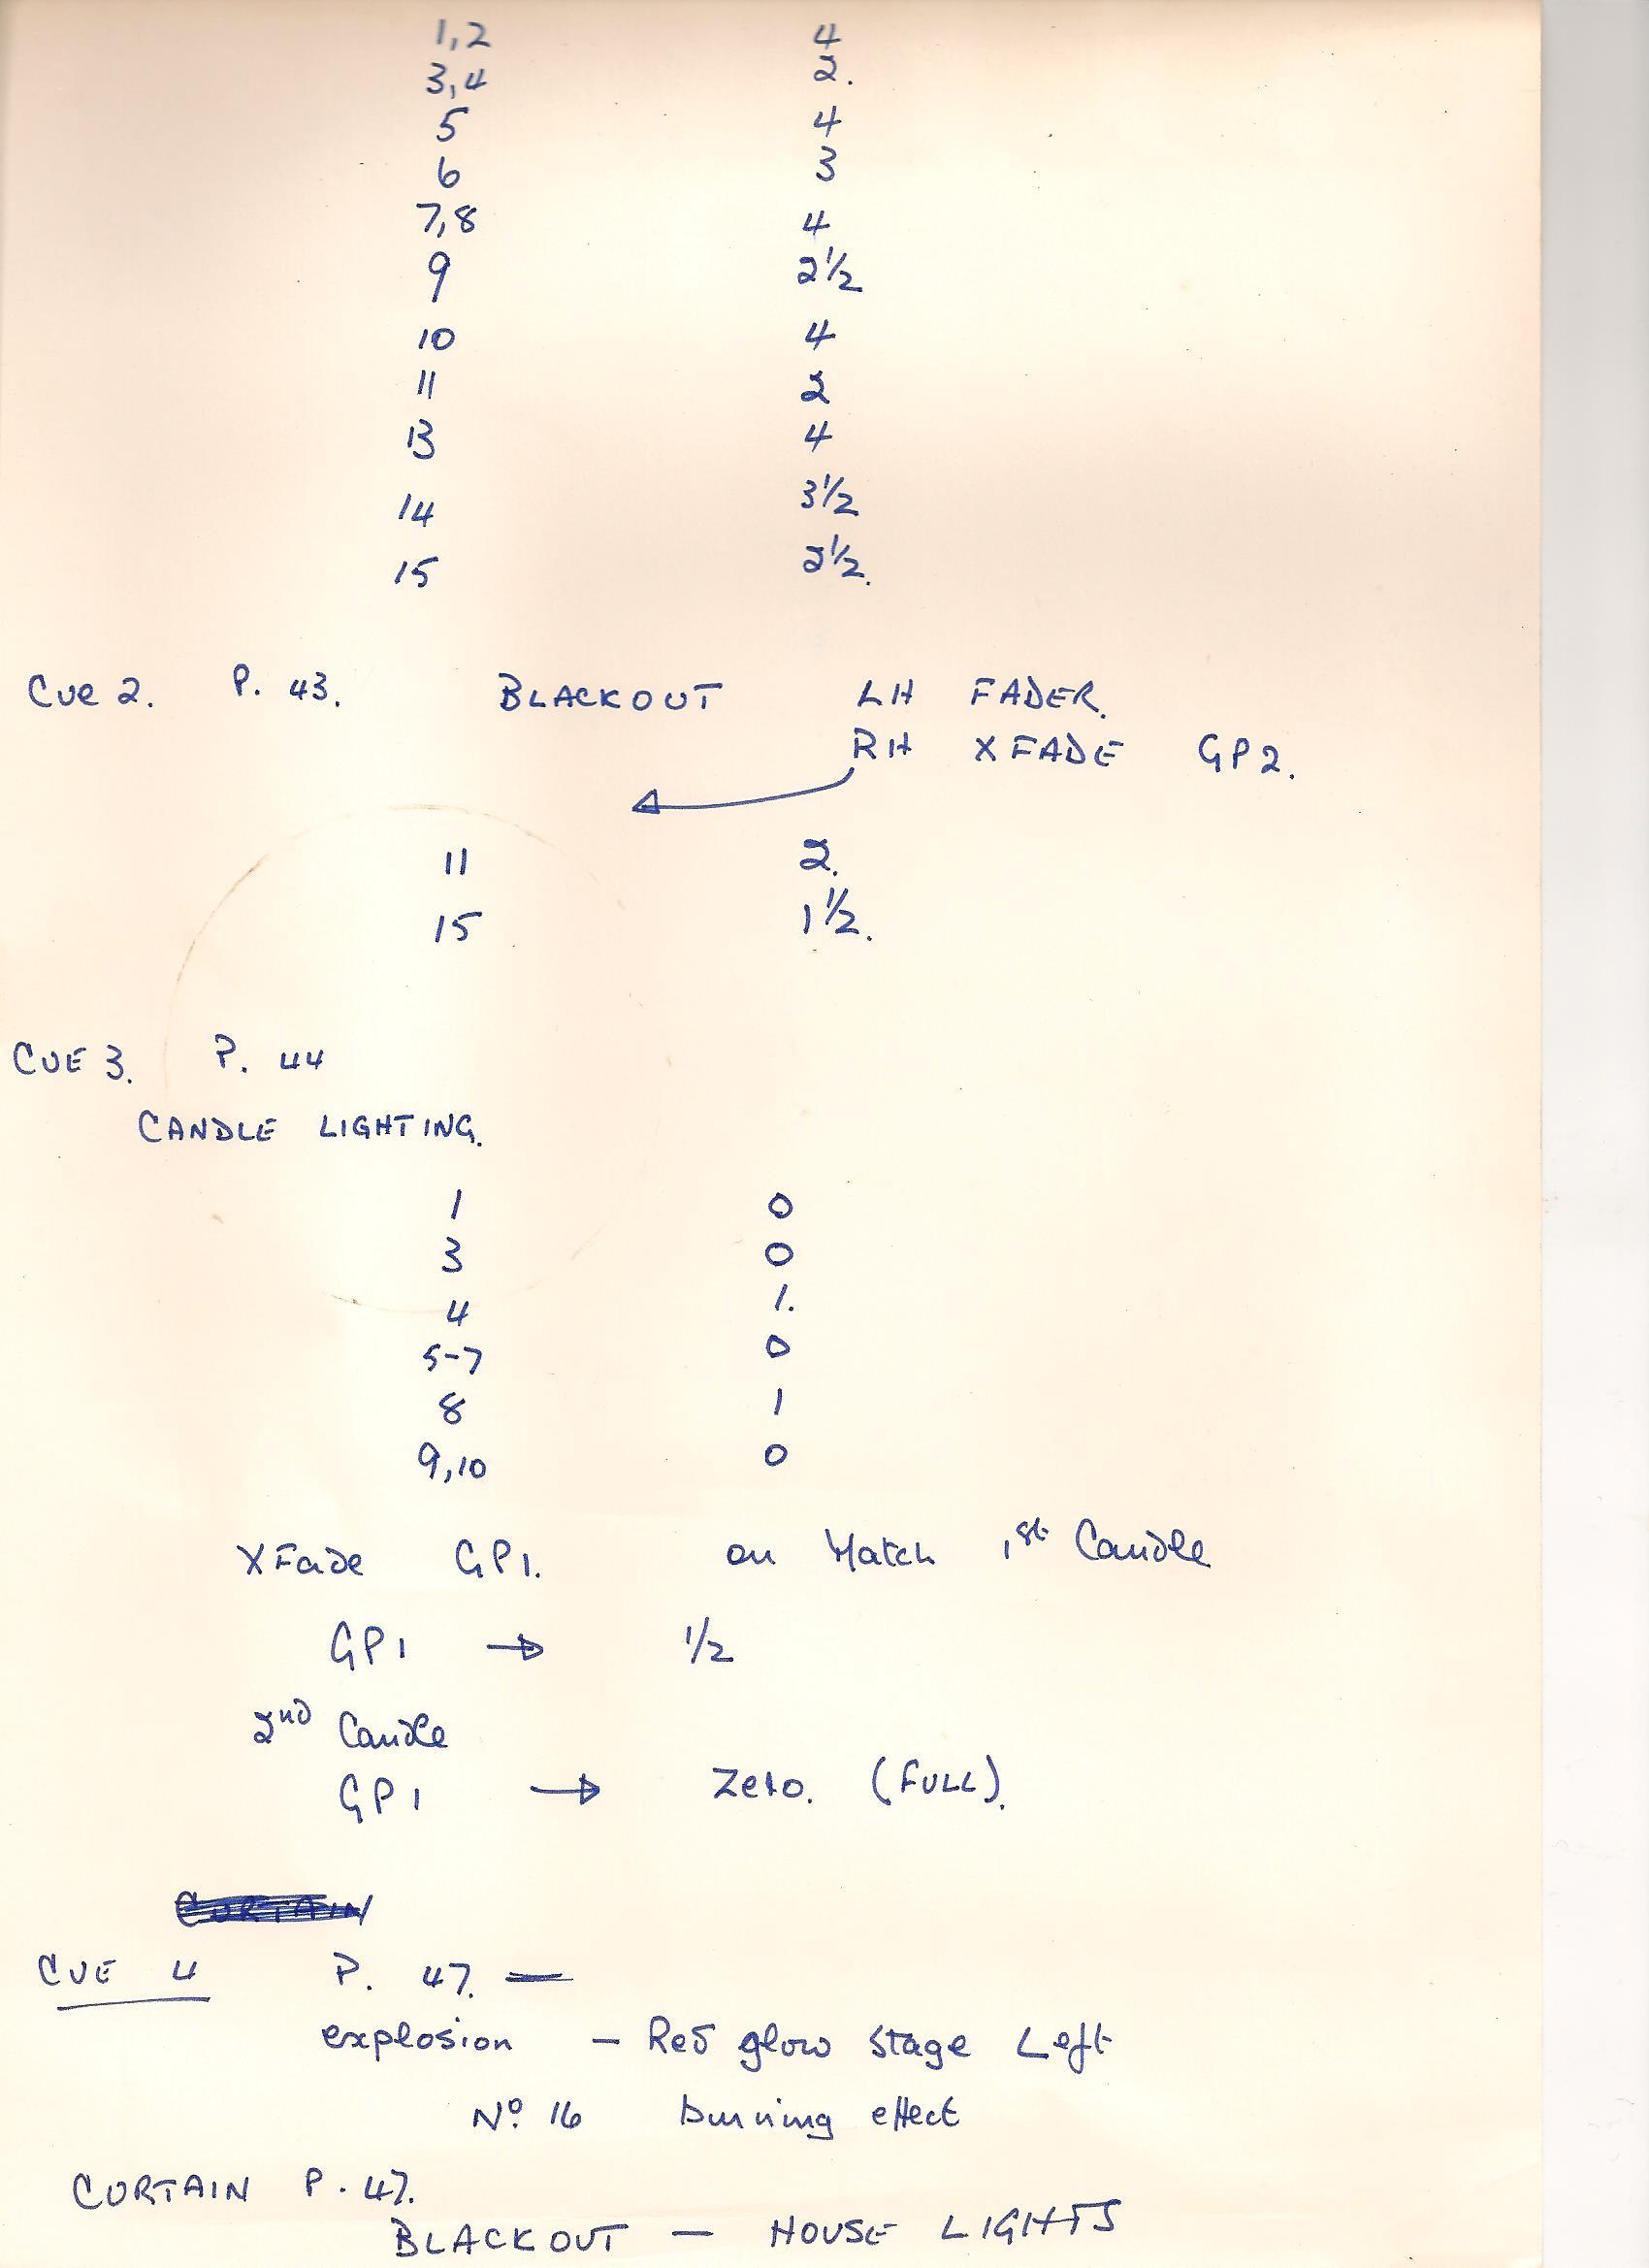 SM's cue sheet 2